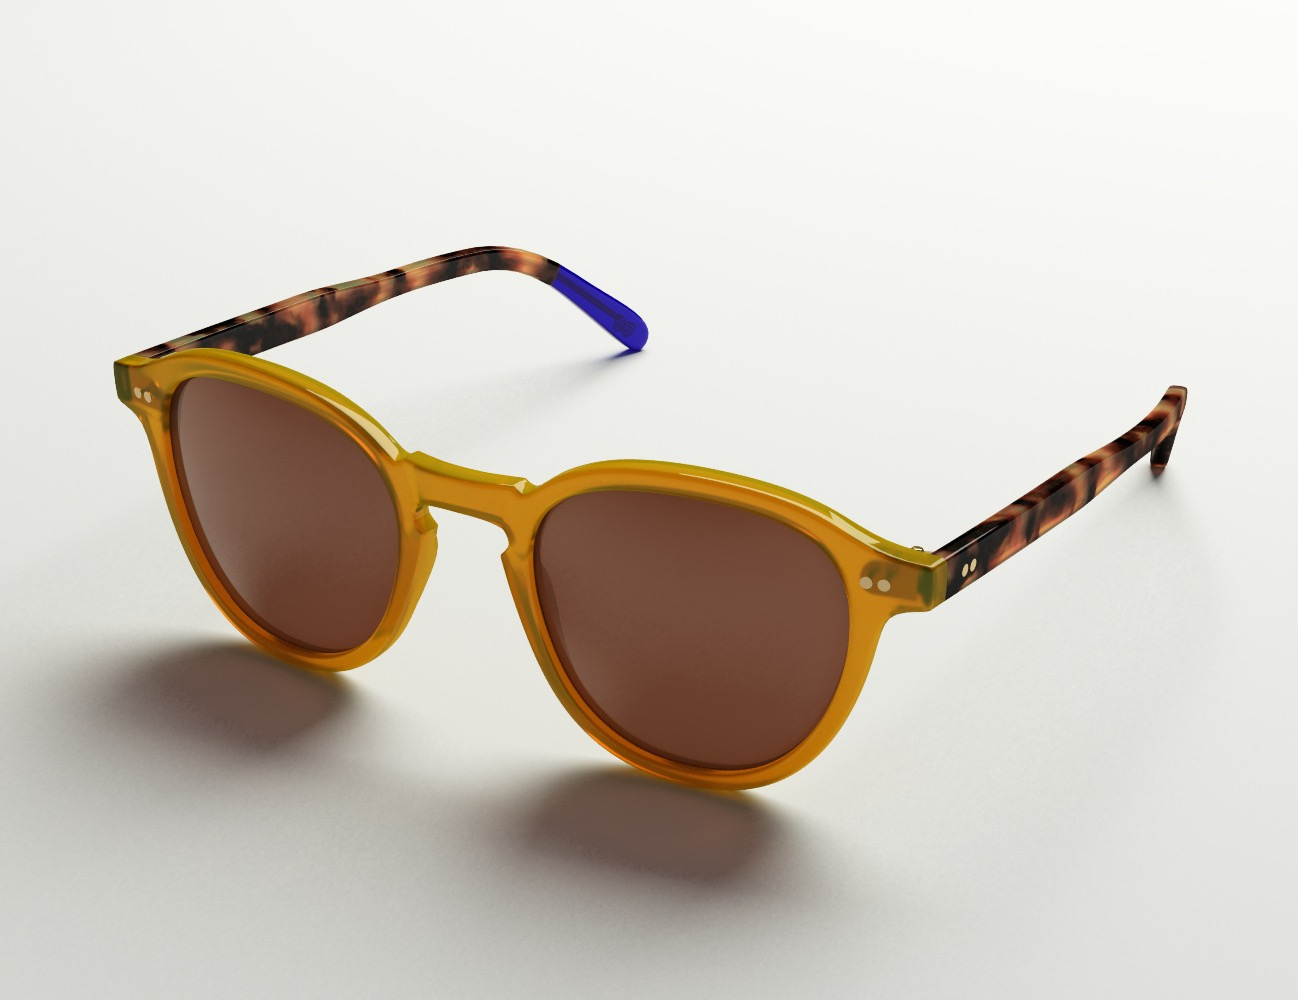 Urban Owl HD Sunglasses